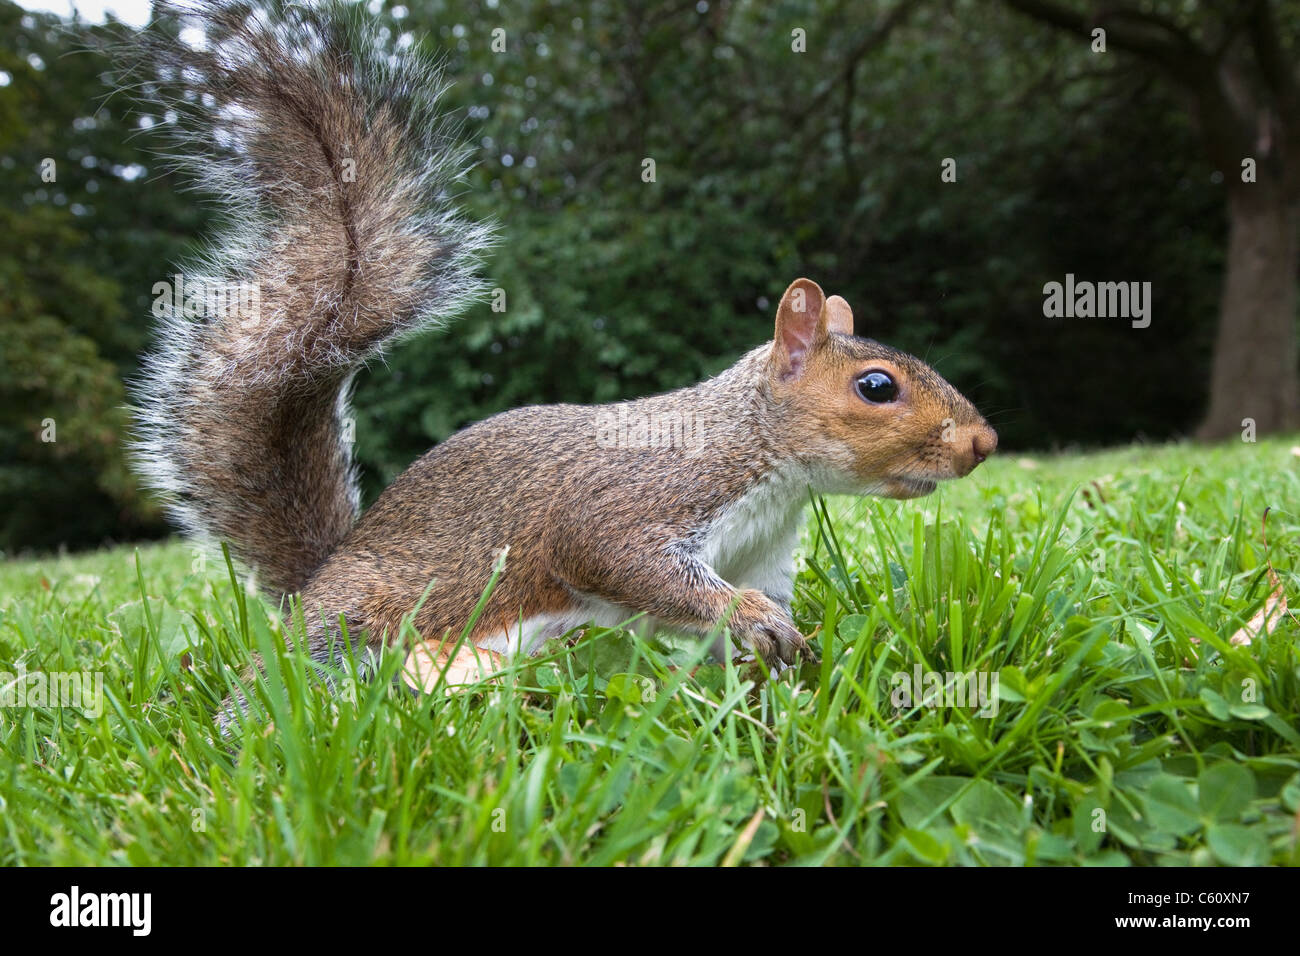 Grey squirrel, Sciurus carolinensis, in city park, Brandon Park, Bristol, UK - Stock Image